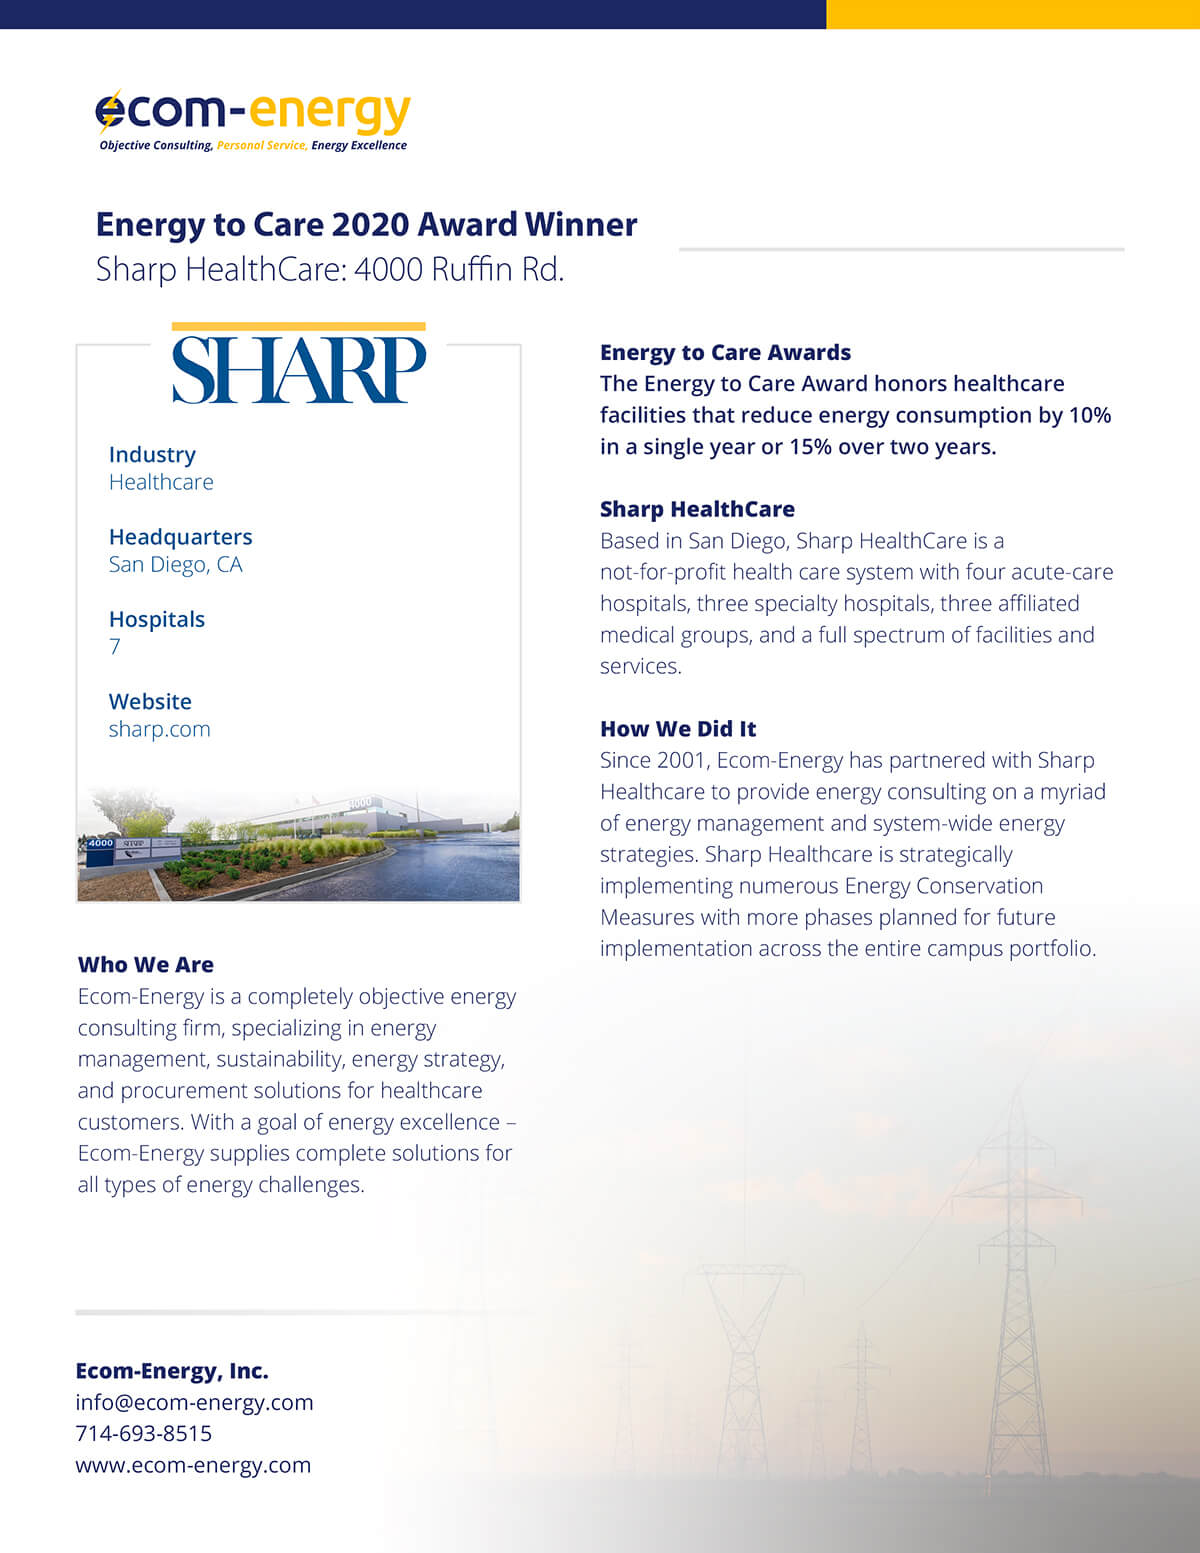 Energy to Care 2020 Award Winner Press Release